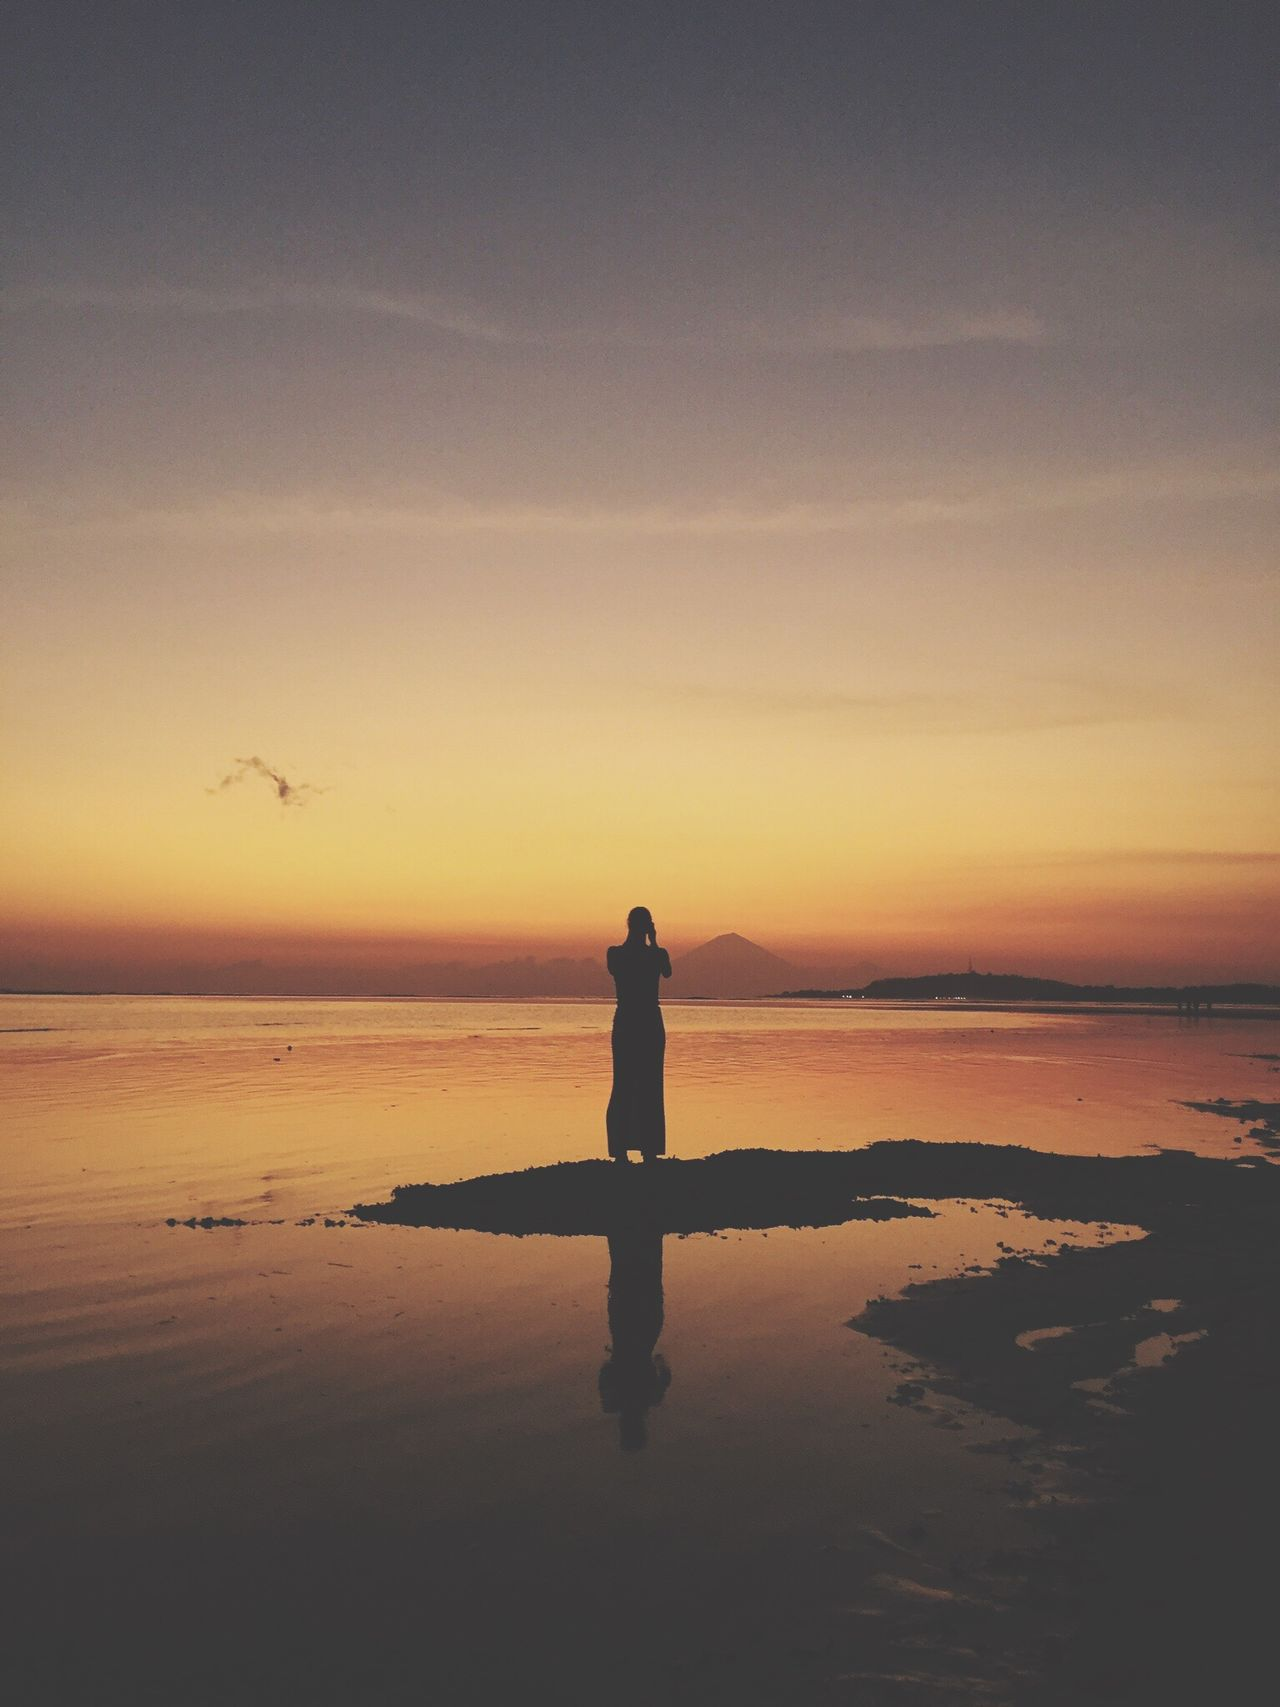 Beautiful stock photos of bali, water, reflection, sunset, nature